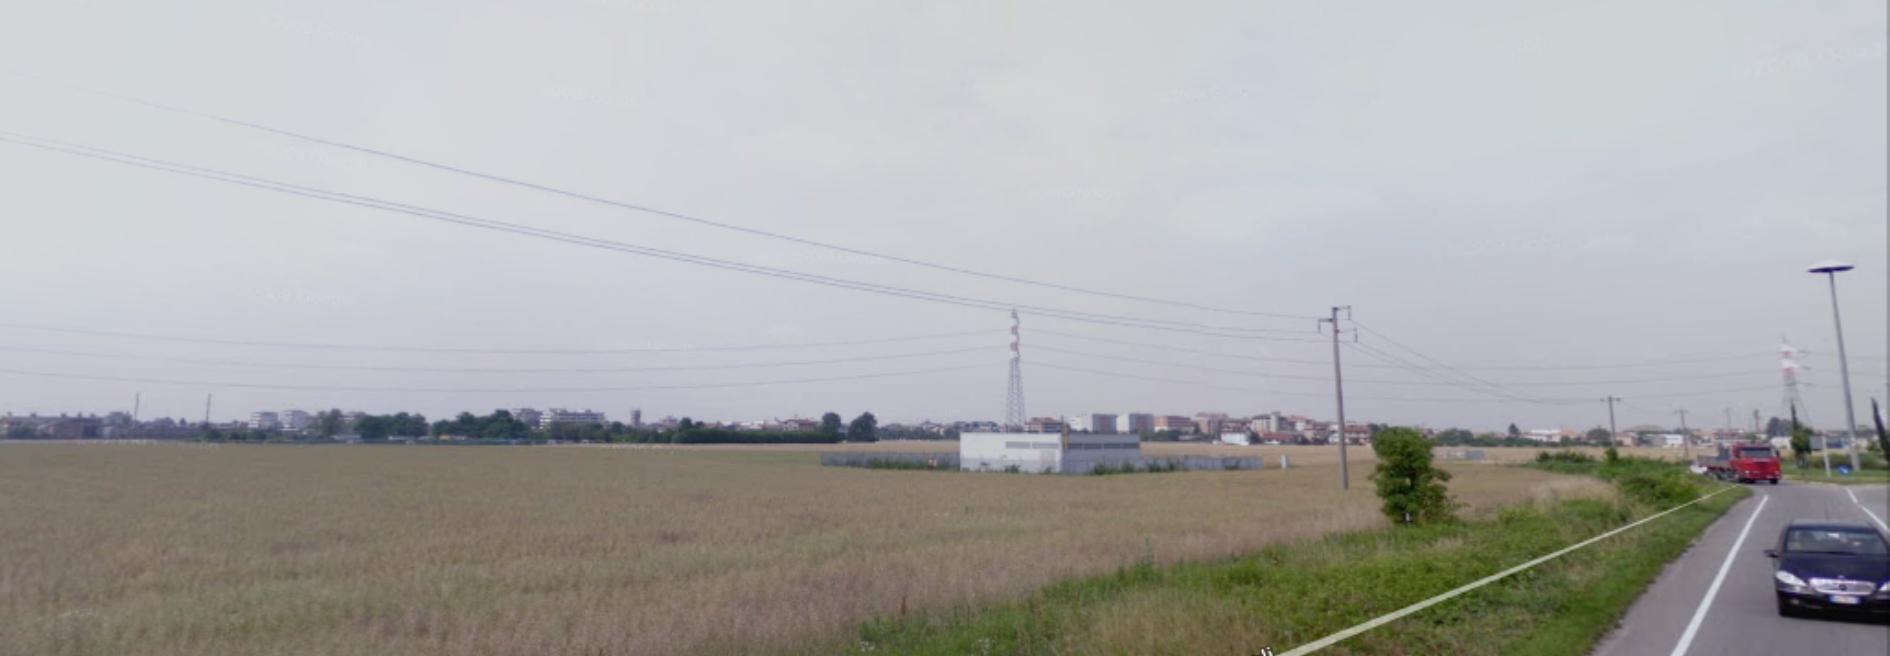 Area residuale tipica dell'hinterland milanese